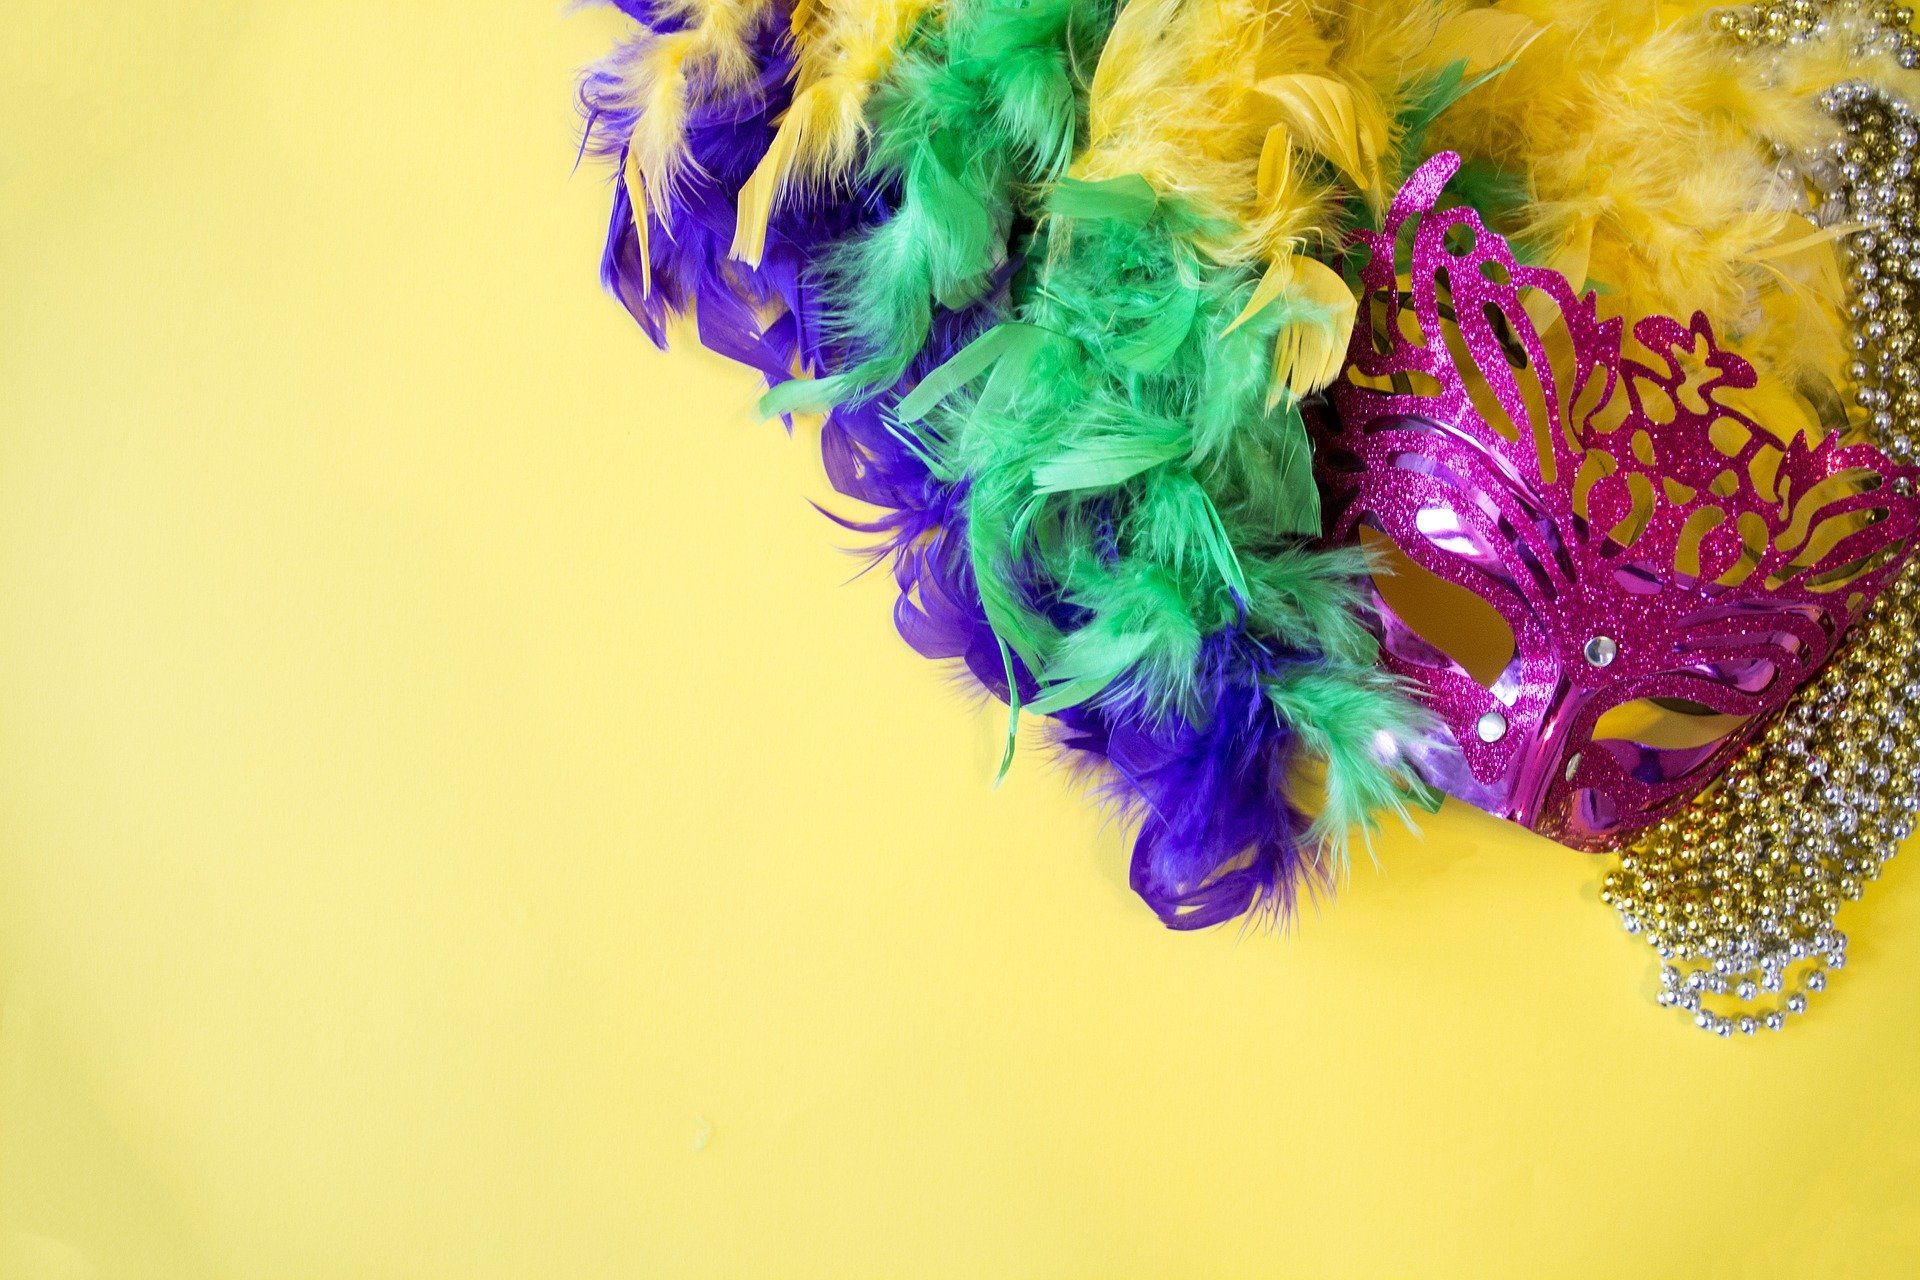 Balmasedako inauteriak 2020 Carnavales de Balmaseda